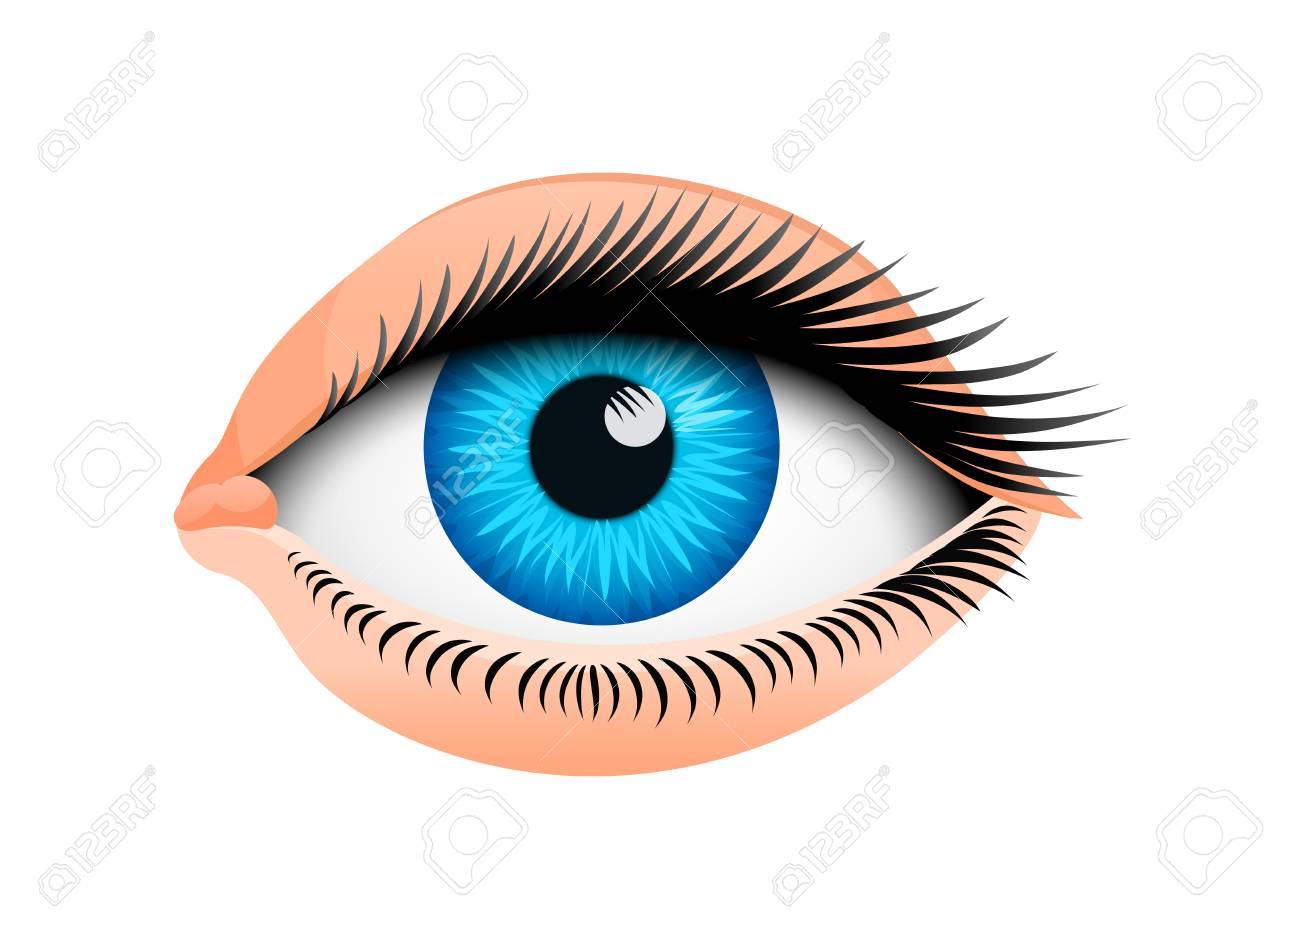 Eye Vector Illustration Human Biology Sensory Organ Anatomy